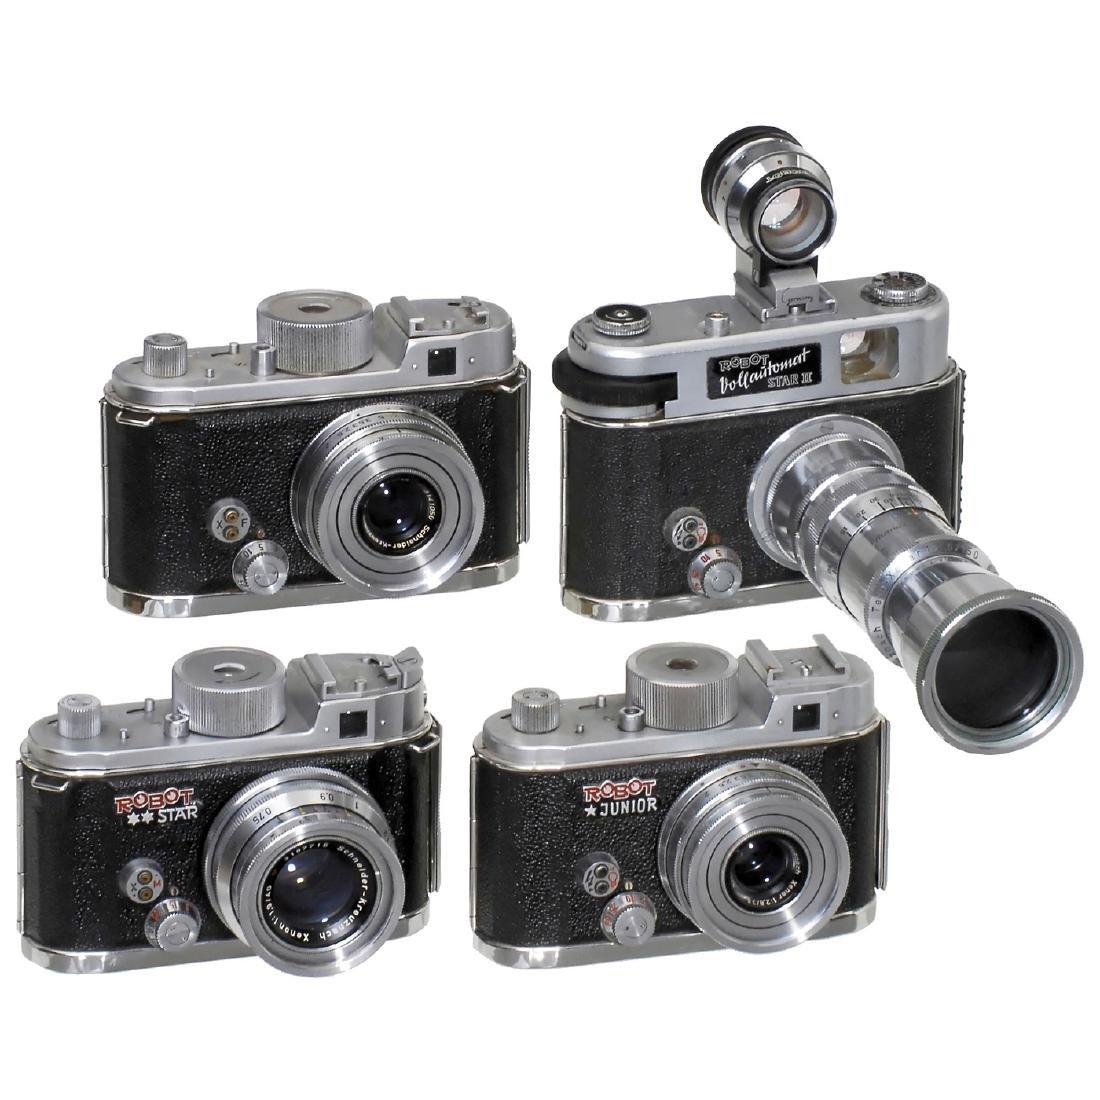 4 Robot Cameras (24 x 24 mm)